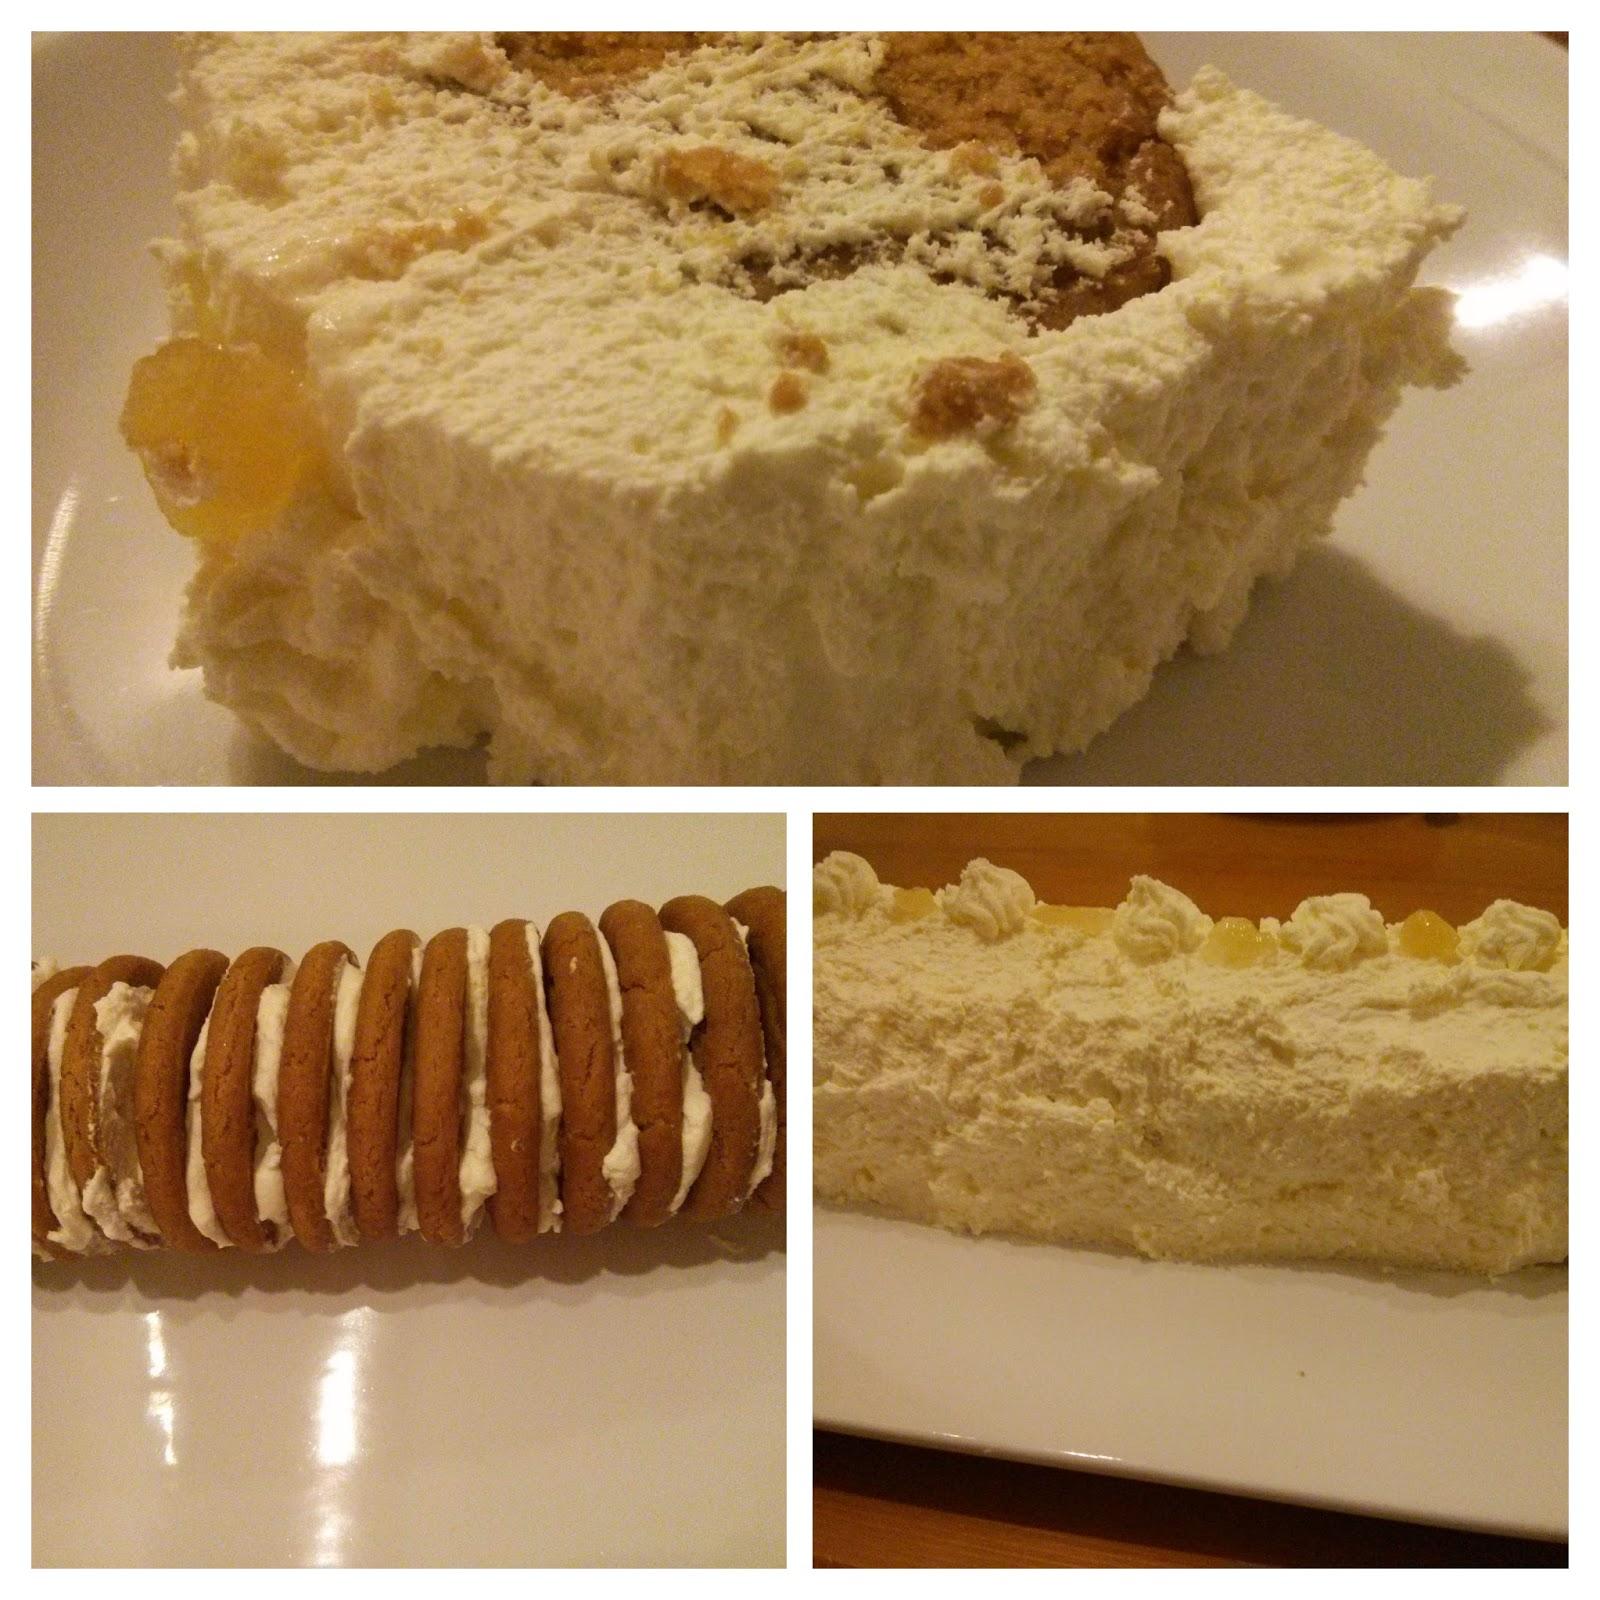 Ginger biscuit cake recipe